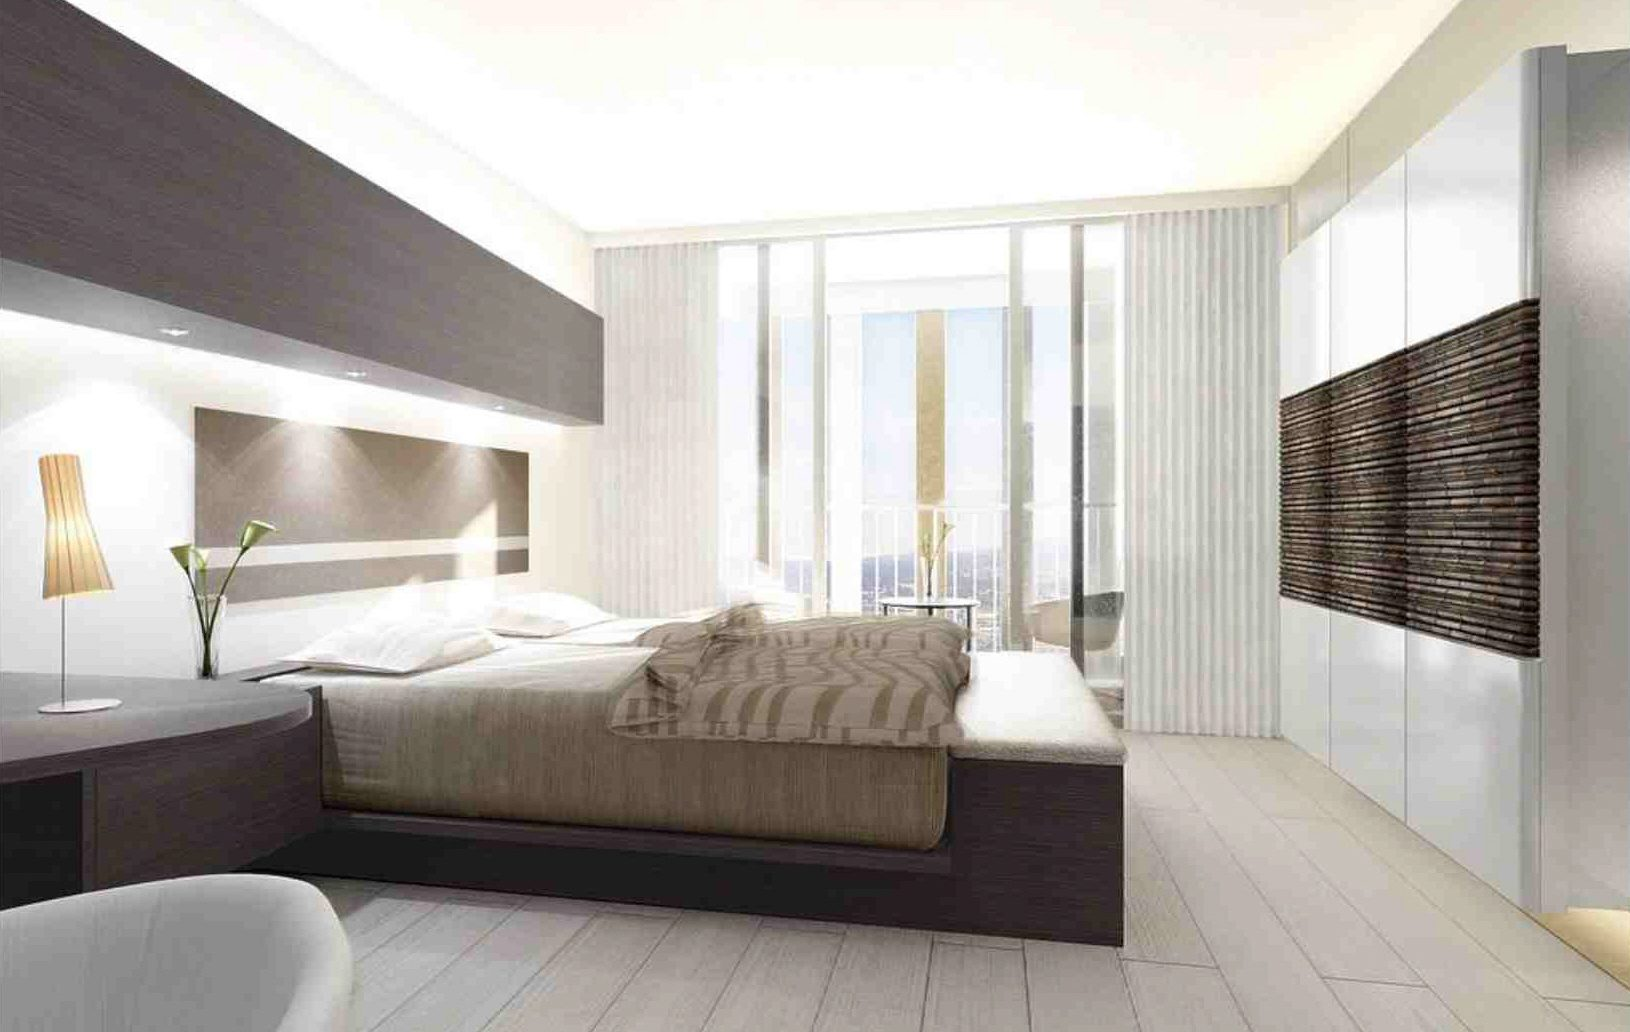 Modulbauweise Hotelzimmer